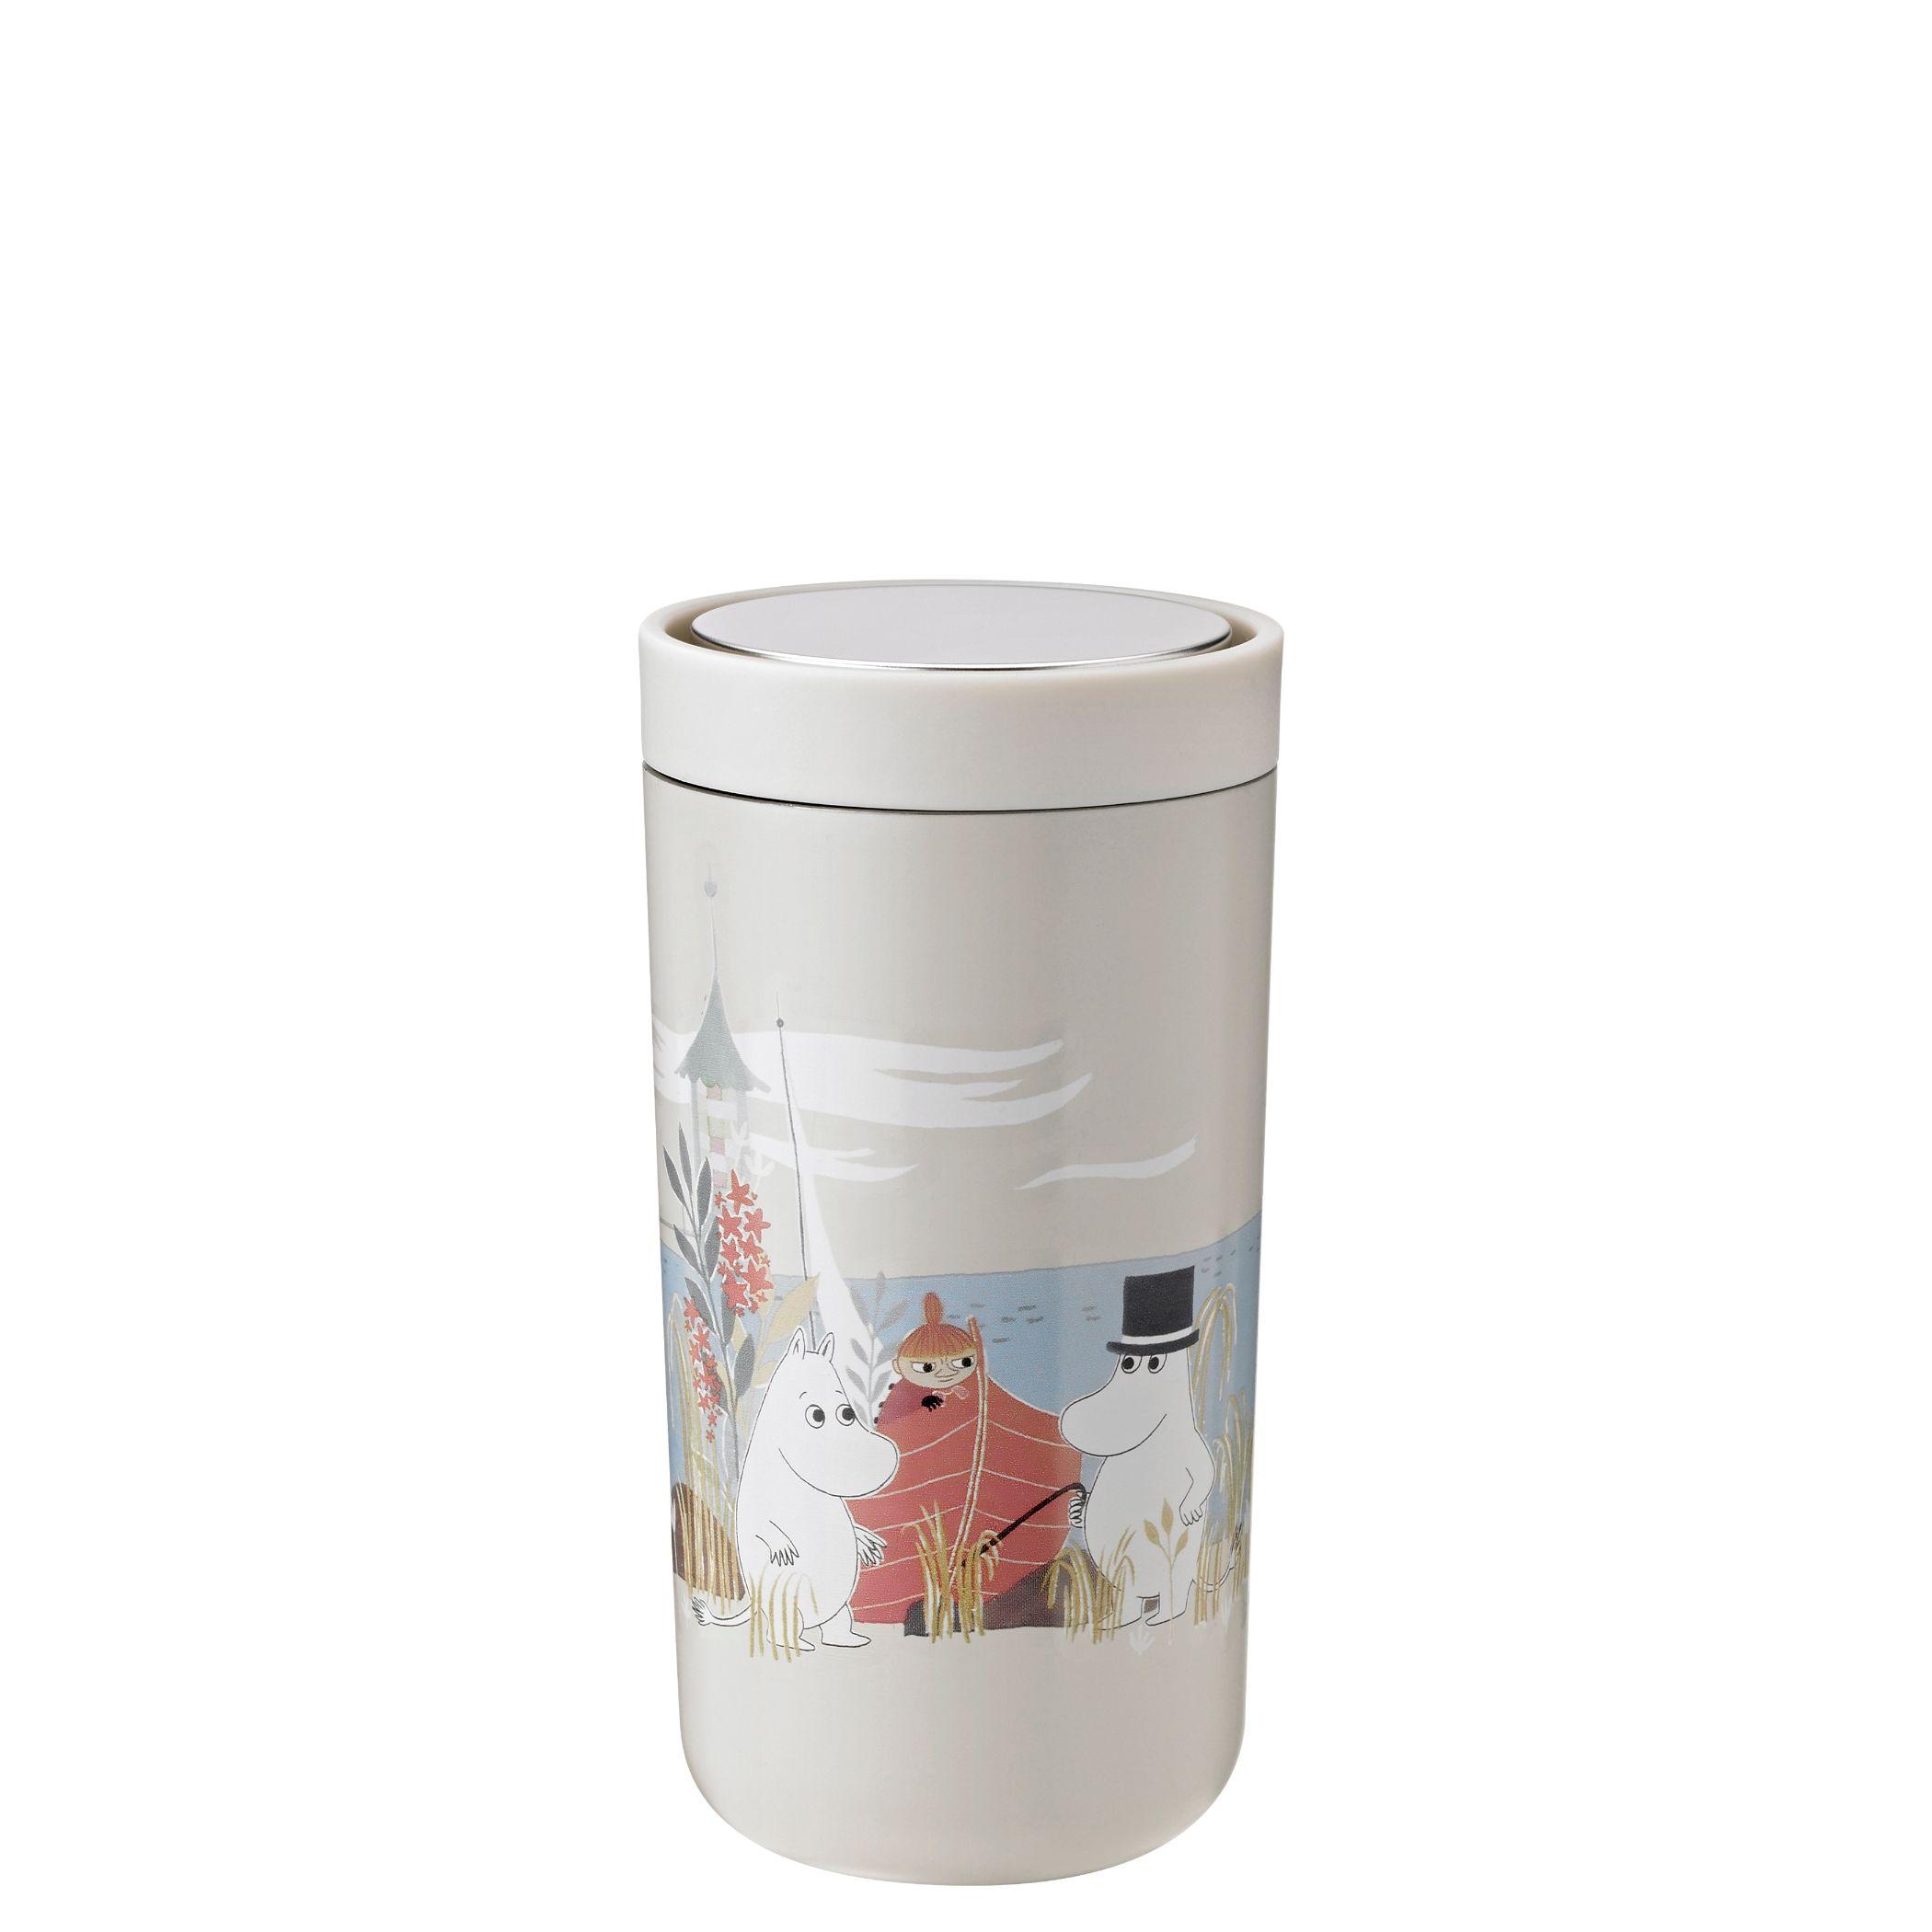 Stelton Mumi To Go Click kop, 200 ml